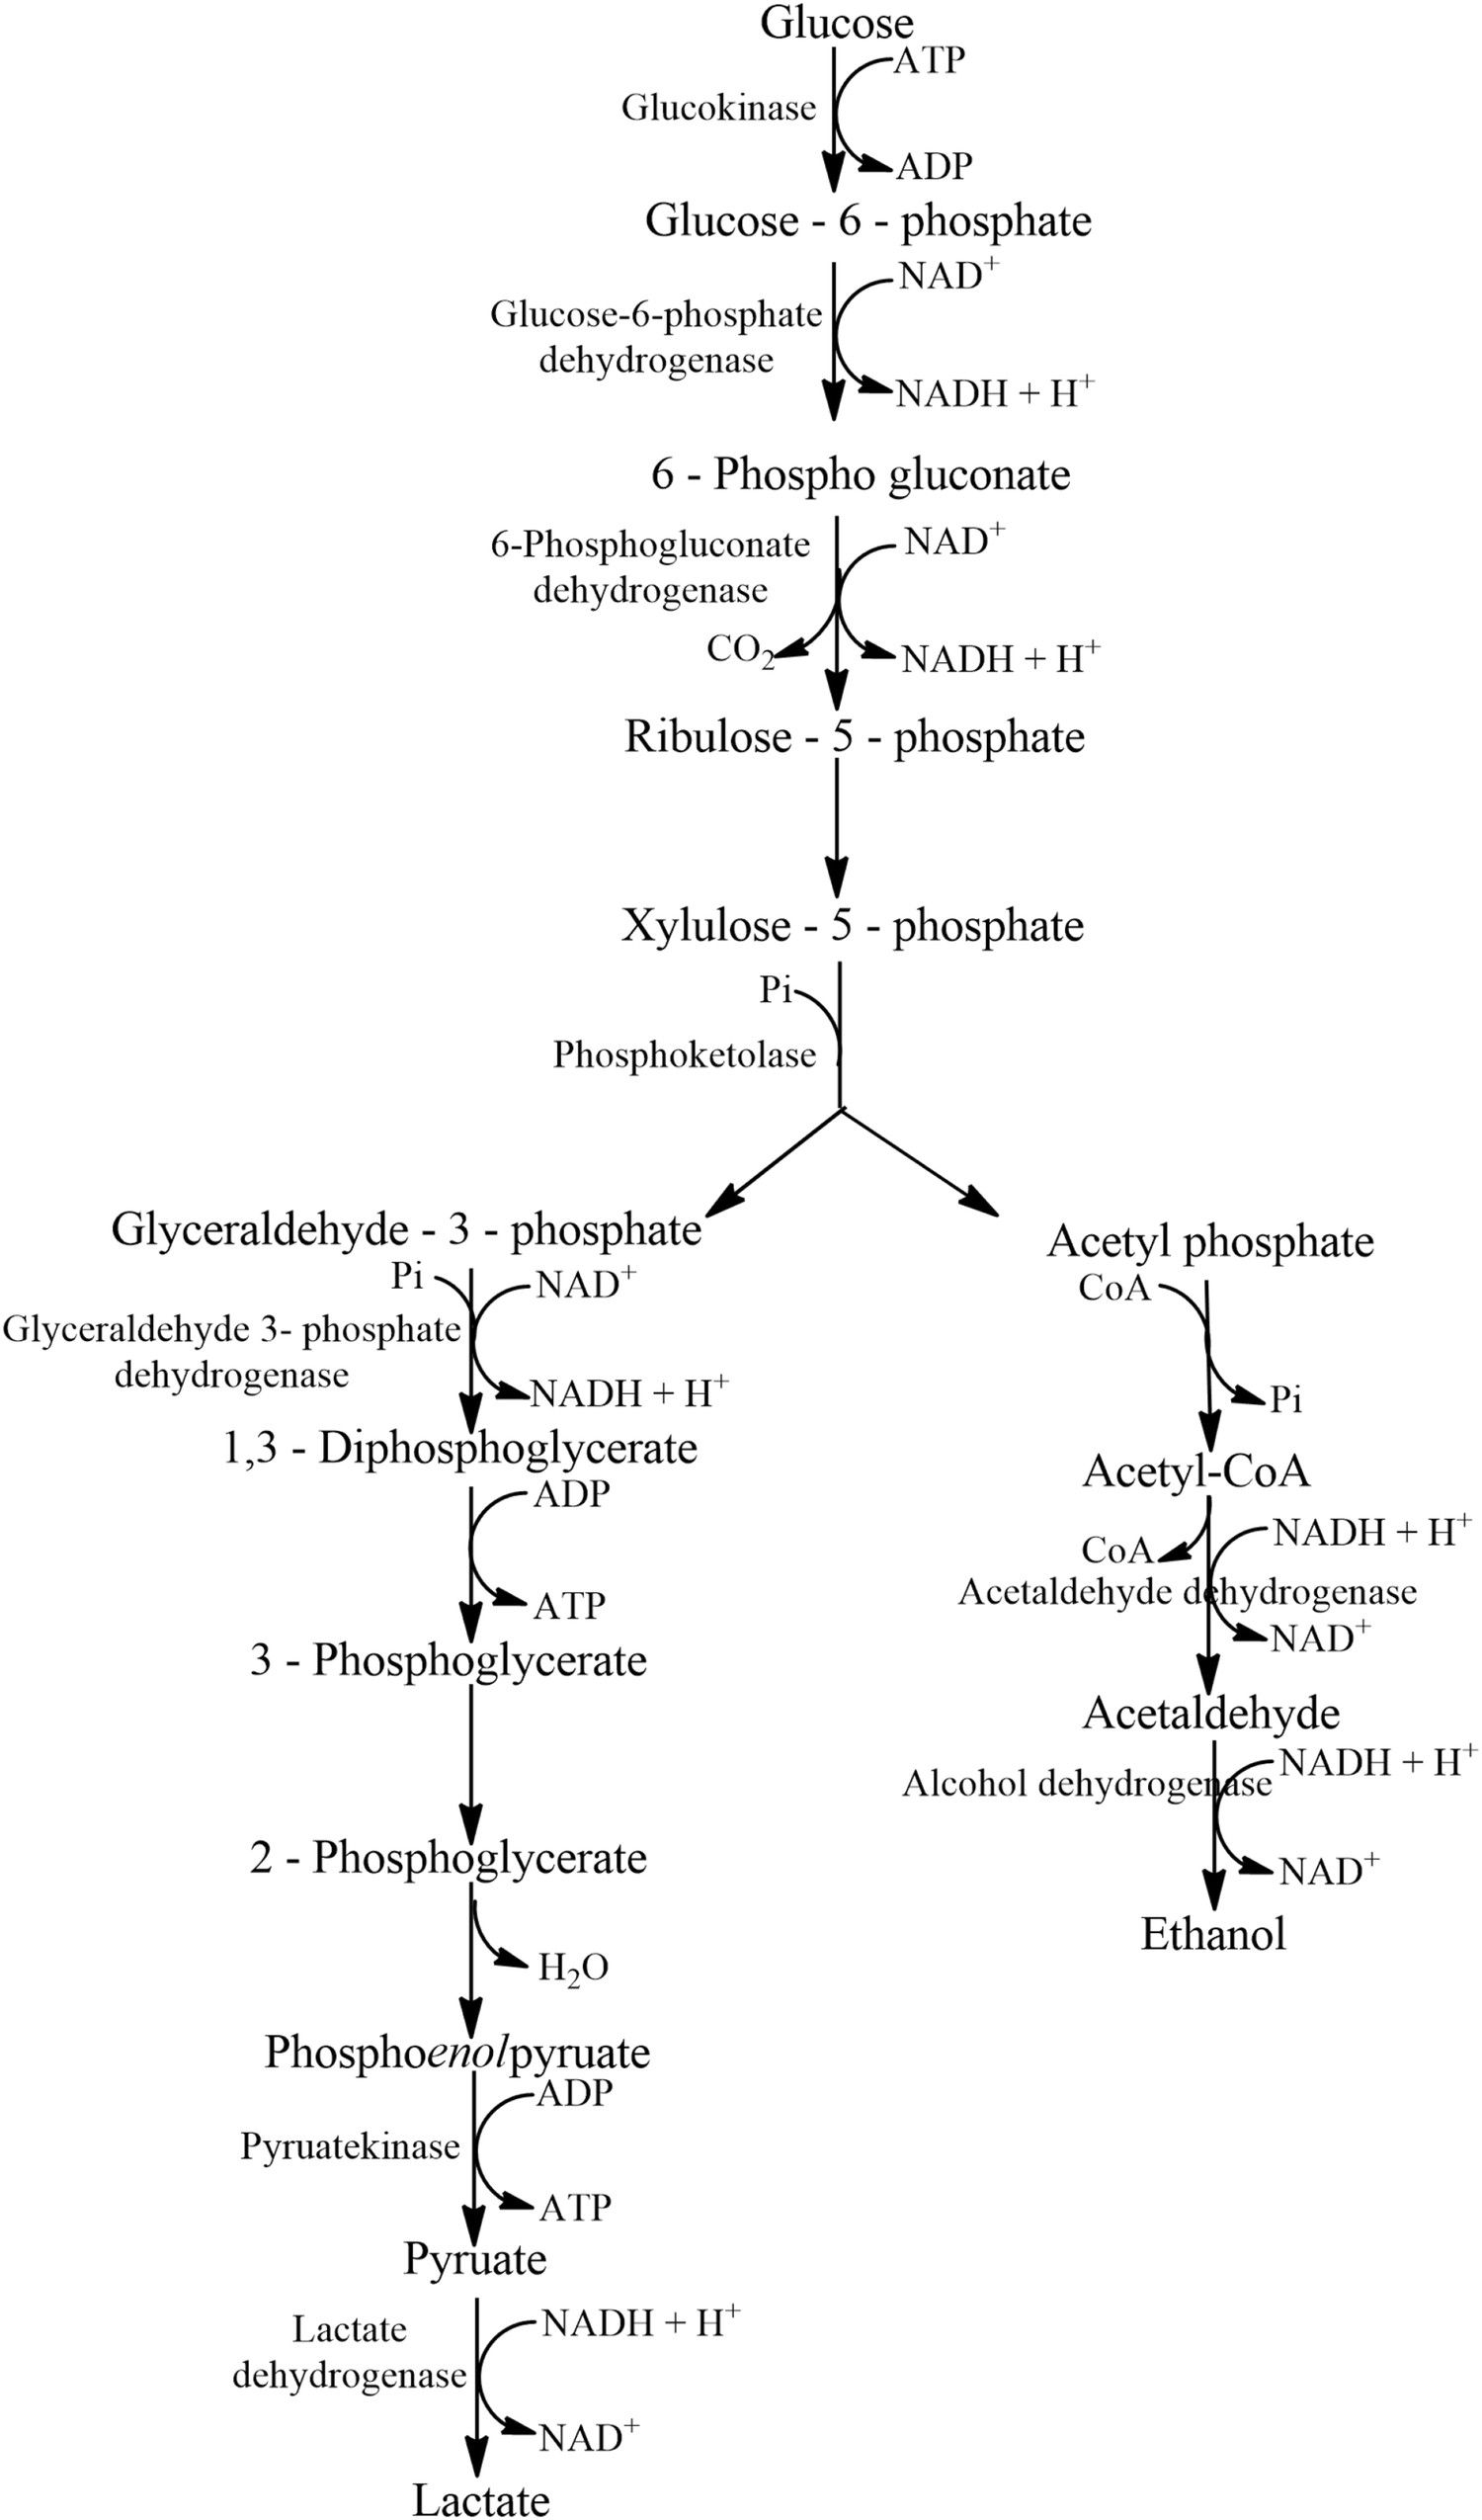 Genomics of Lactic Acid Bacteria for Glycerol Dissimilation